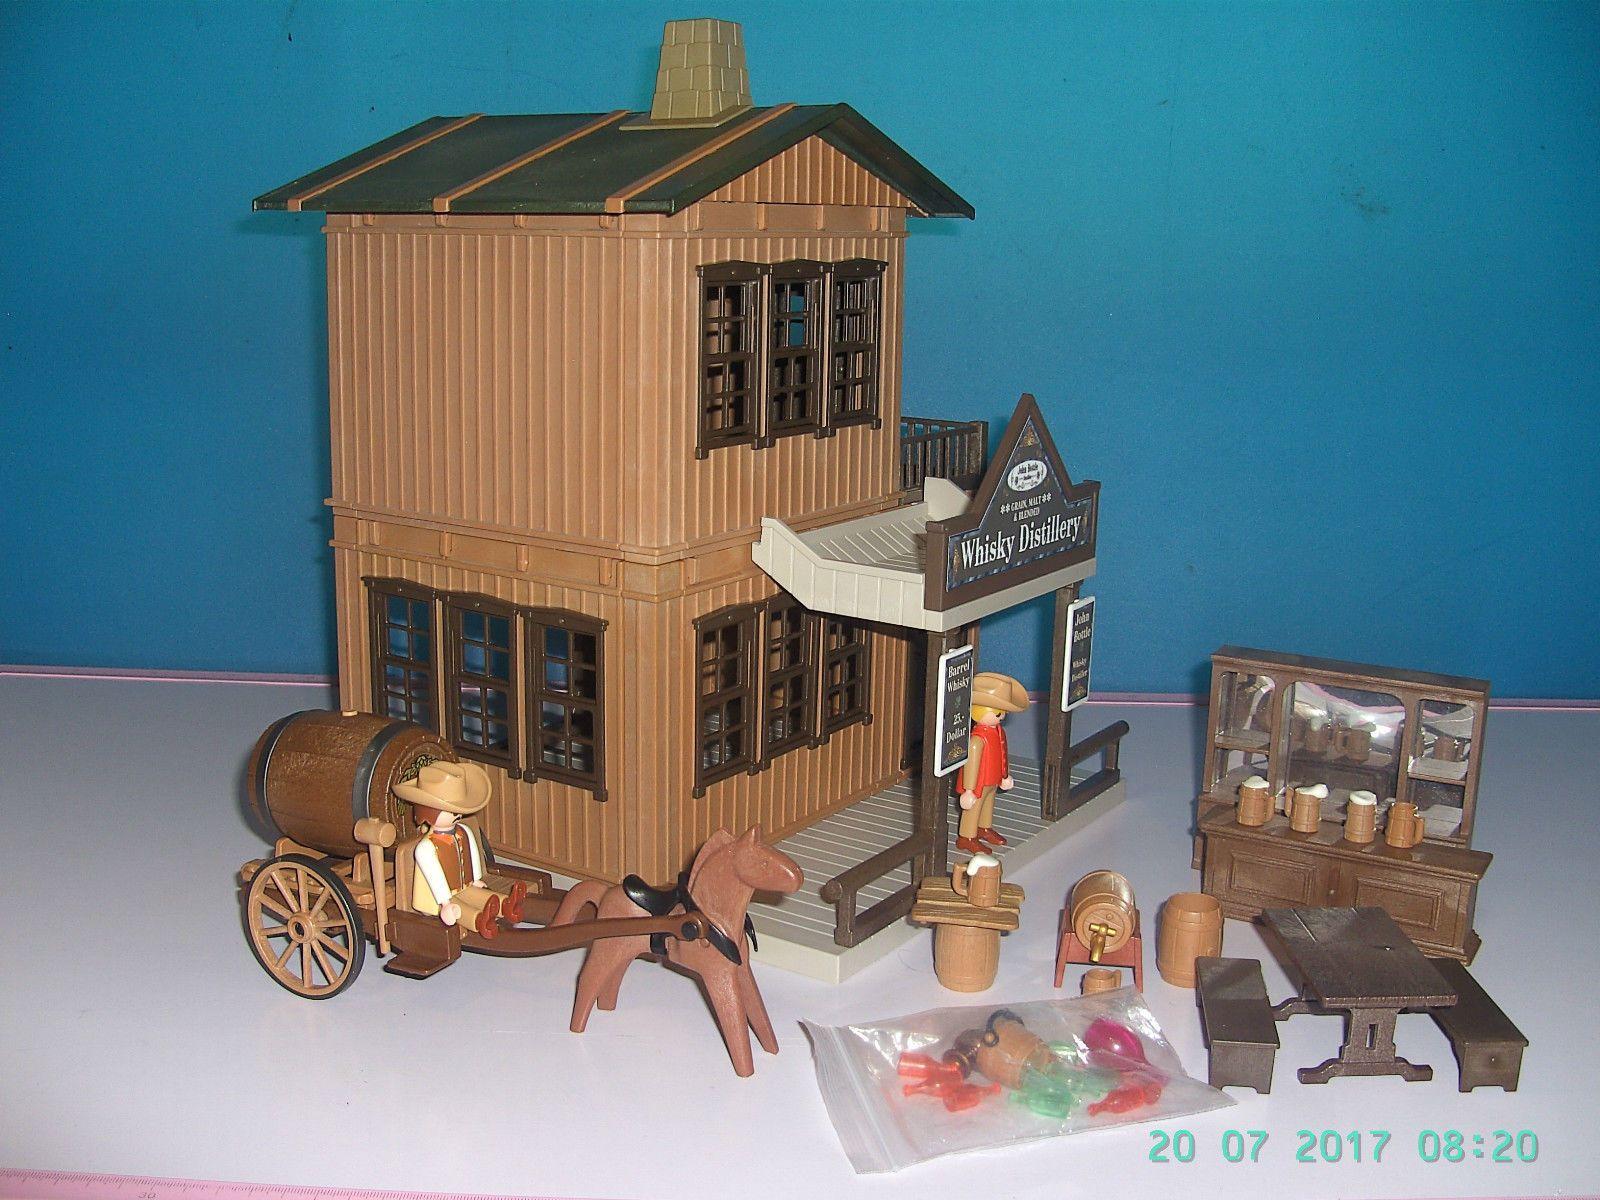 Playmobil lgb acw western haus whisky distillery xxl for Playmobil haus schlafzimmer